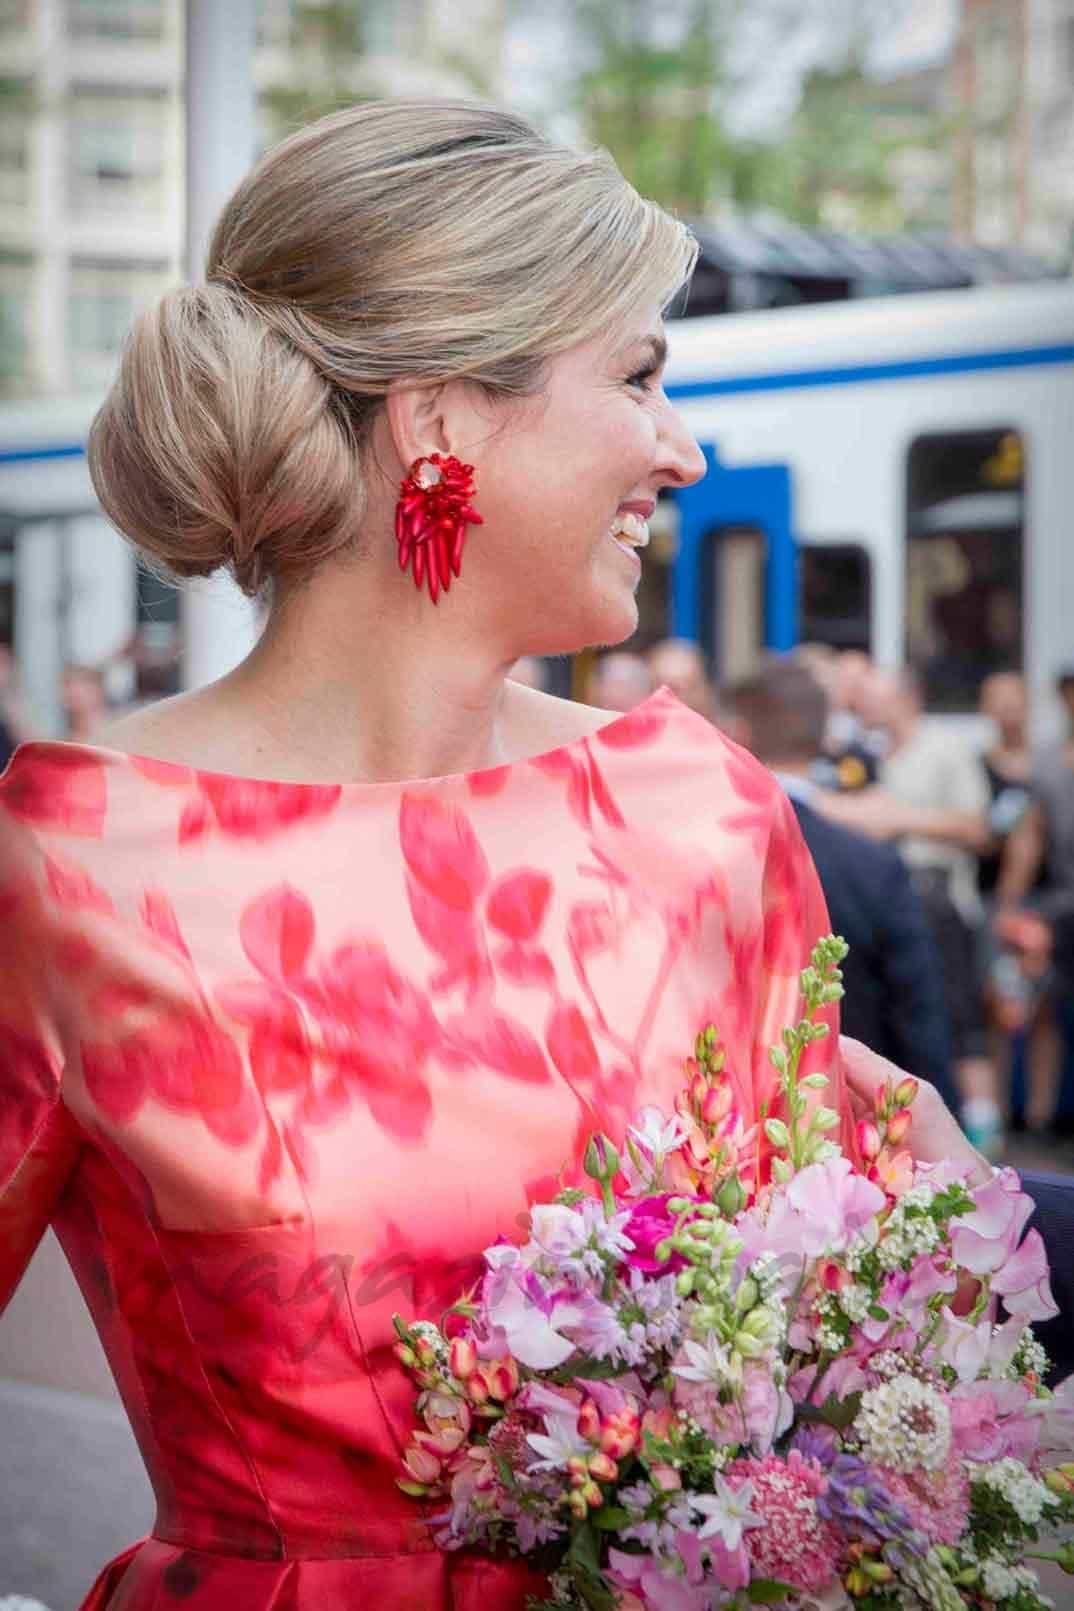 primavera en el traje de la reina maxima de holanda